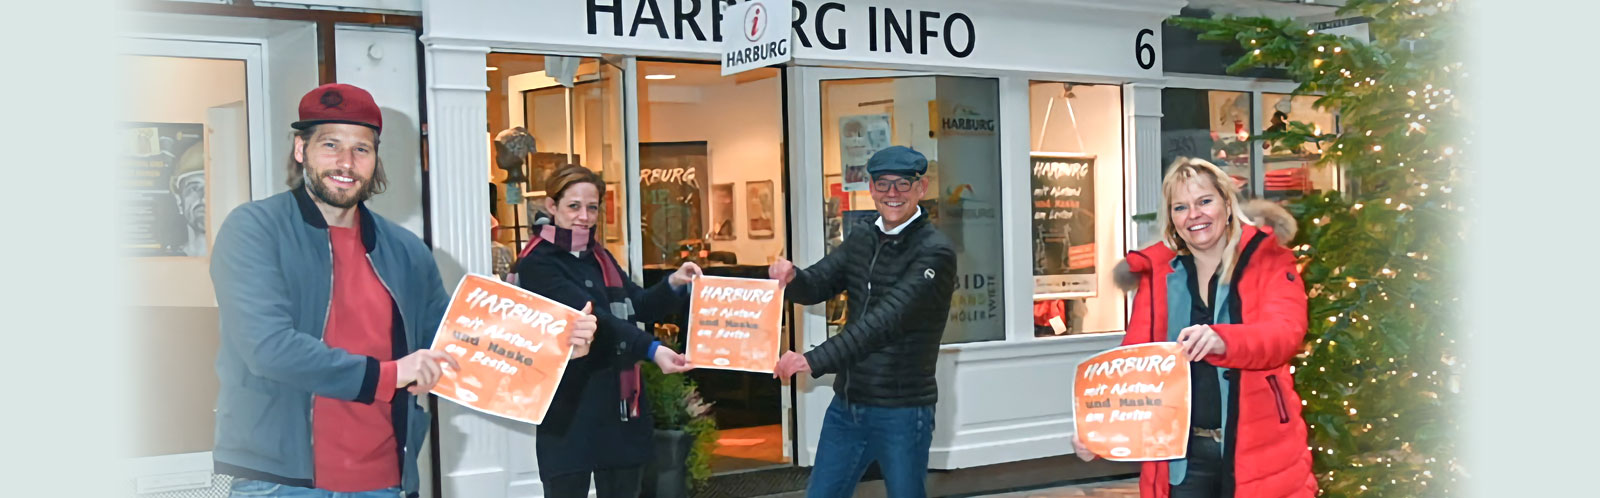 "Spendenübergabe mit ""Bergretter"" - print-o-tec unterstützt Human@Human 1"